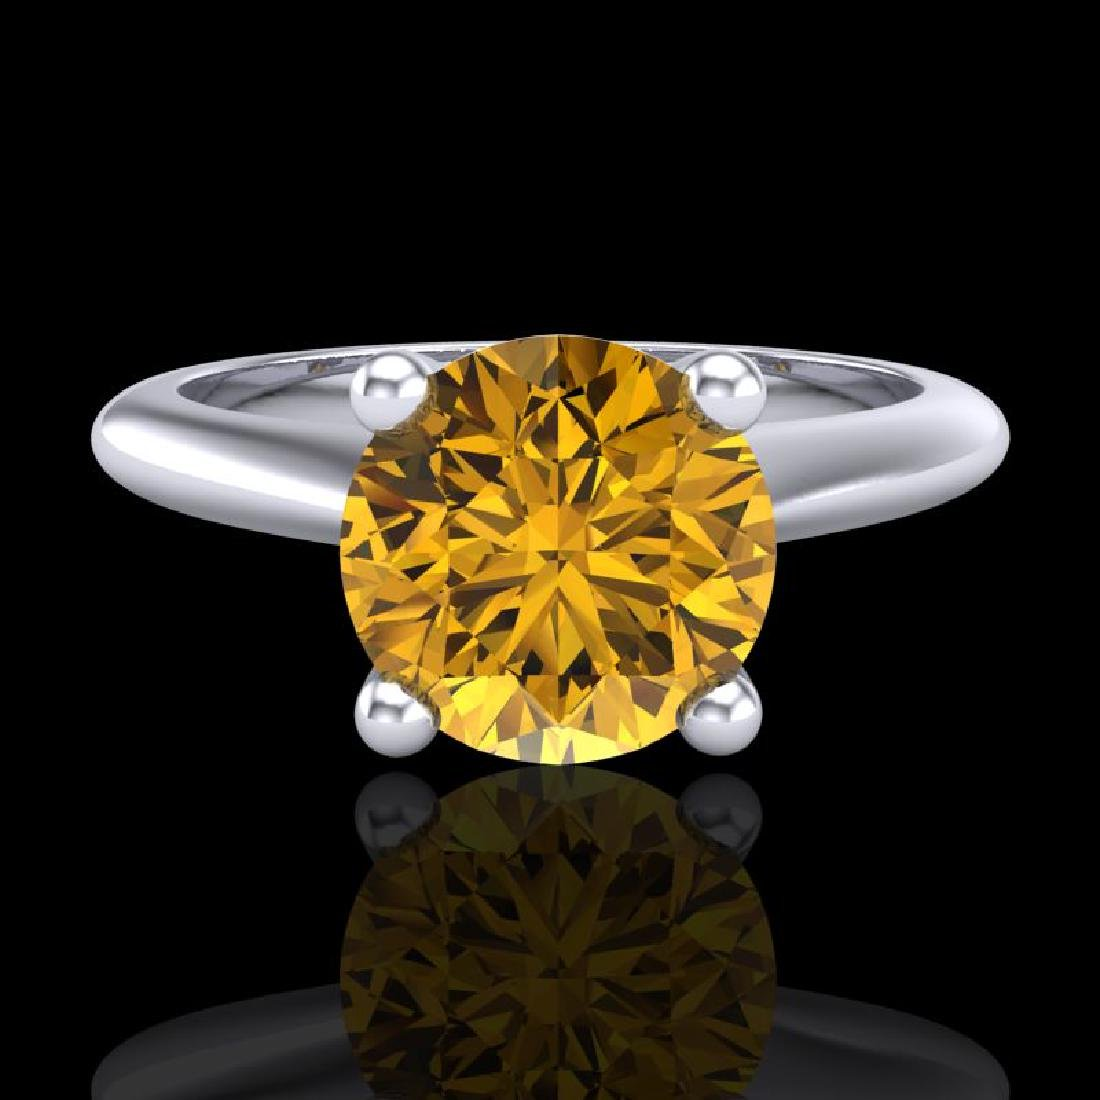 1.6 CTW Intense Fancy Yellow Diamond Engagement Art - 2